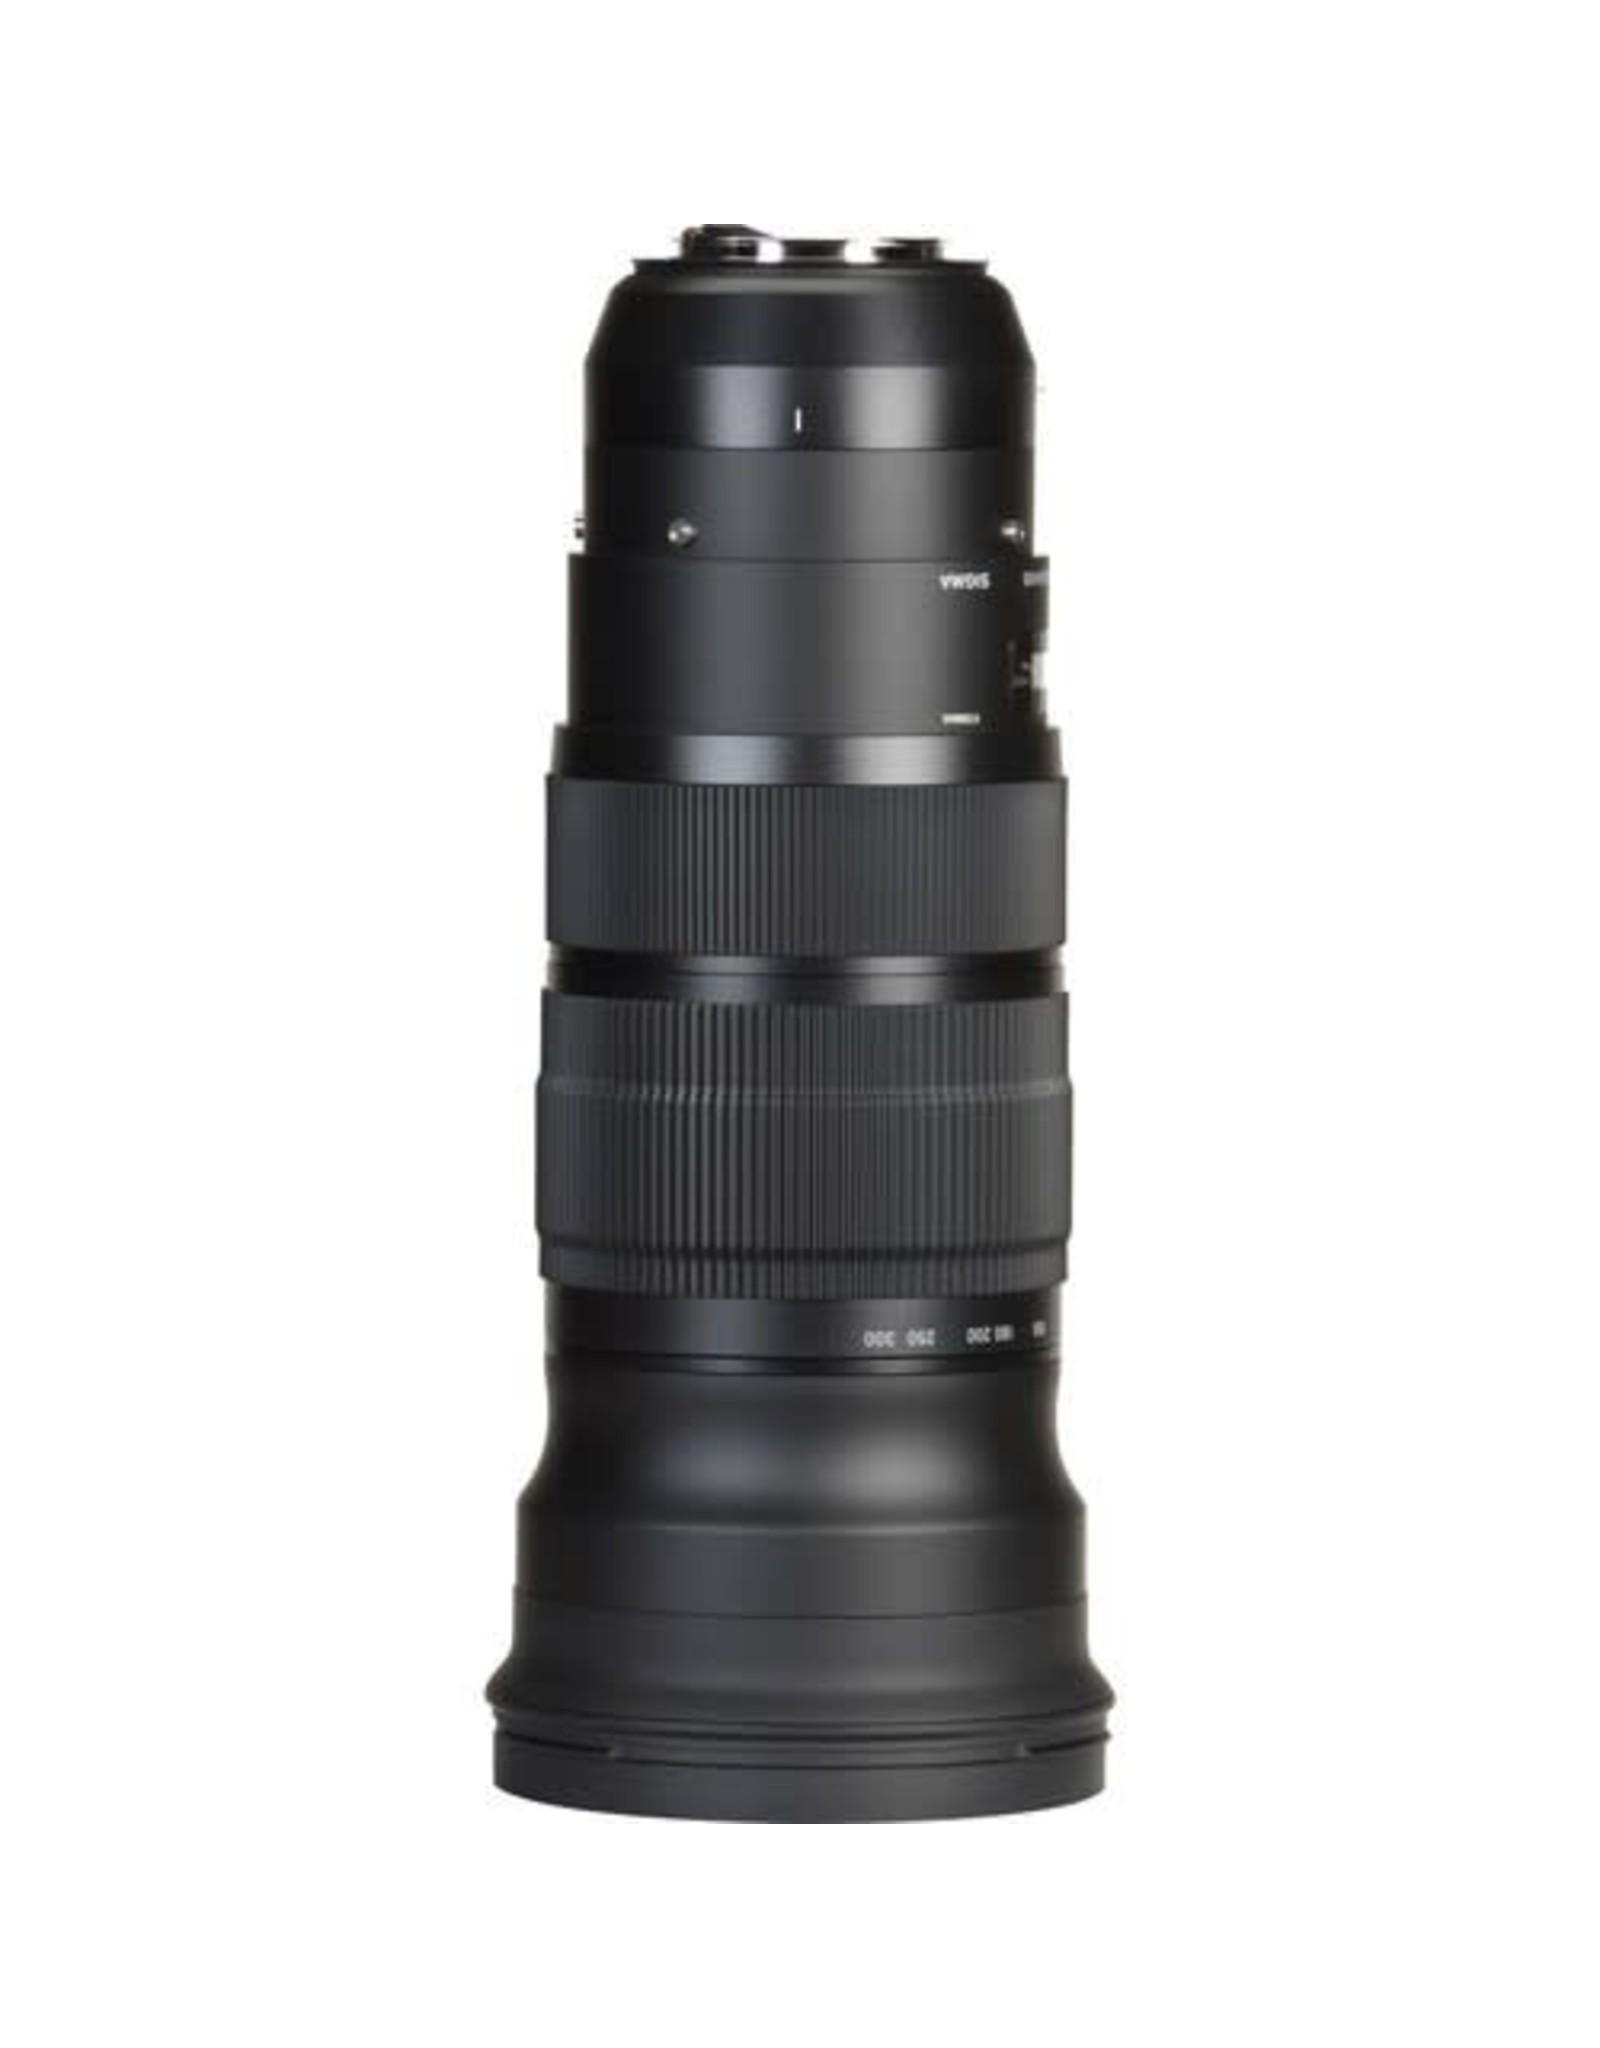 Sigma Sigma 120-300mm f2.8 Sports DG  APO OS HSM (Specify Mount Type)